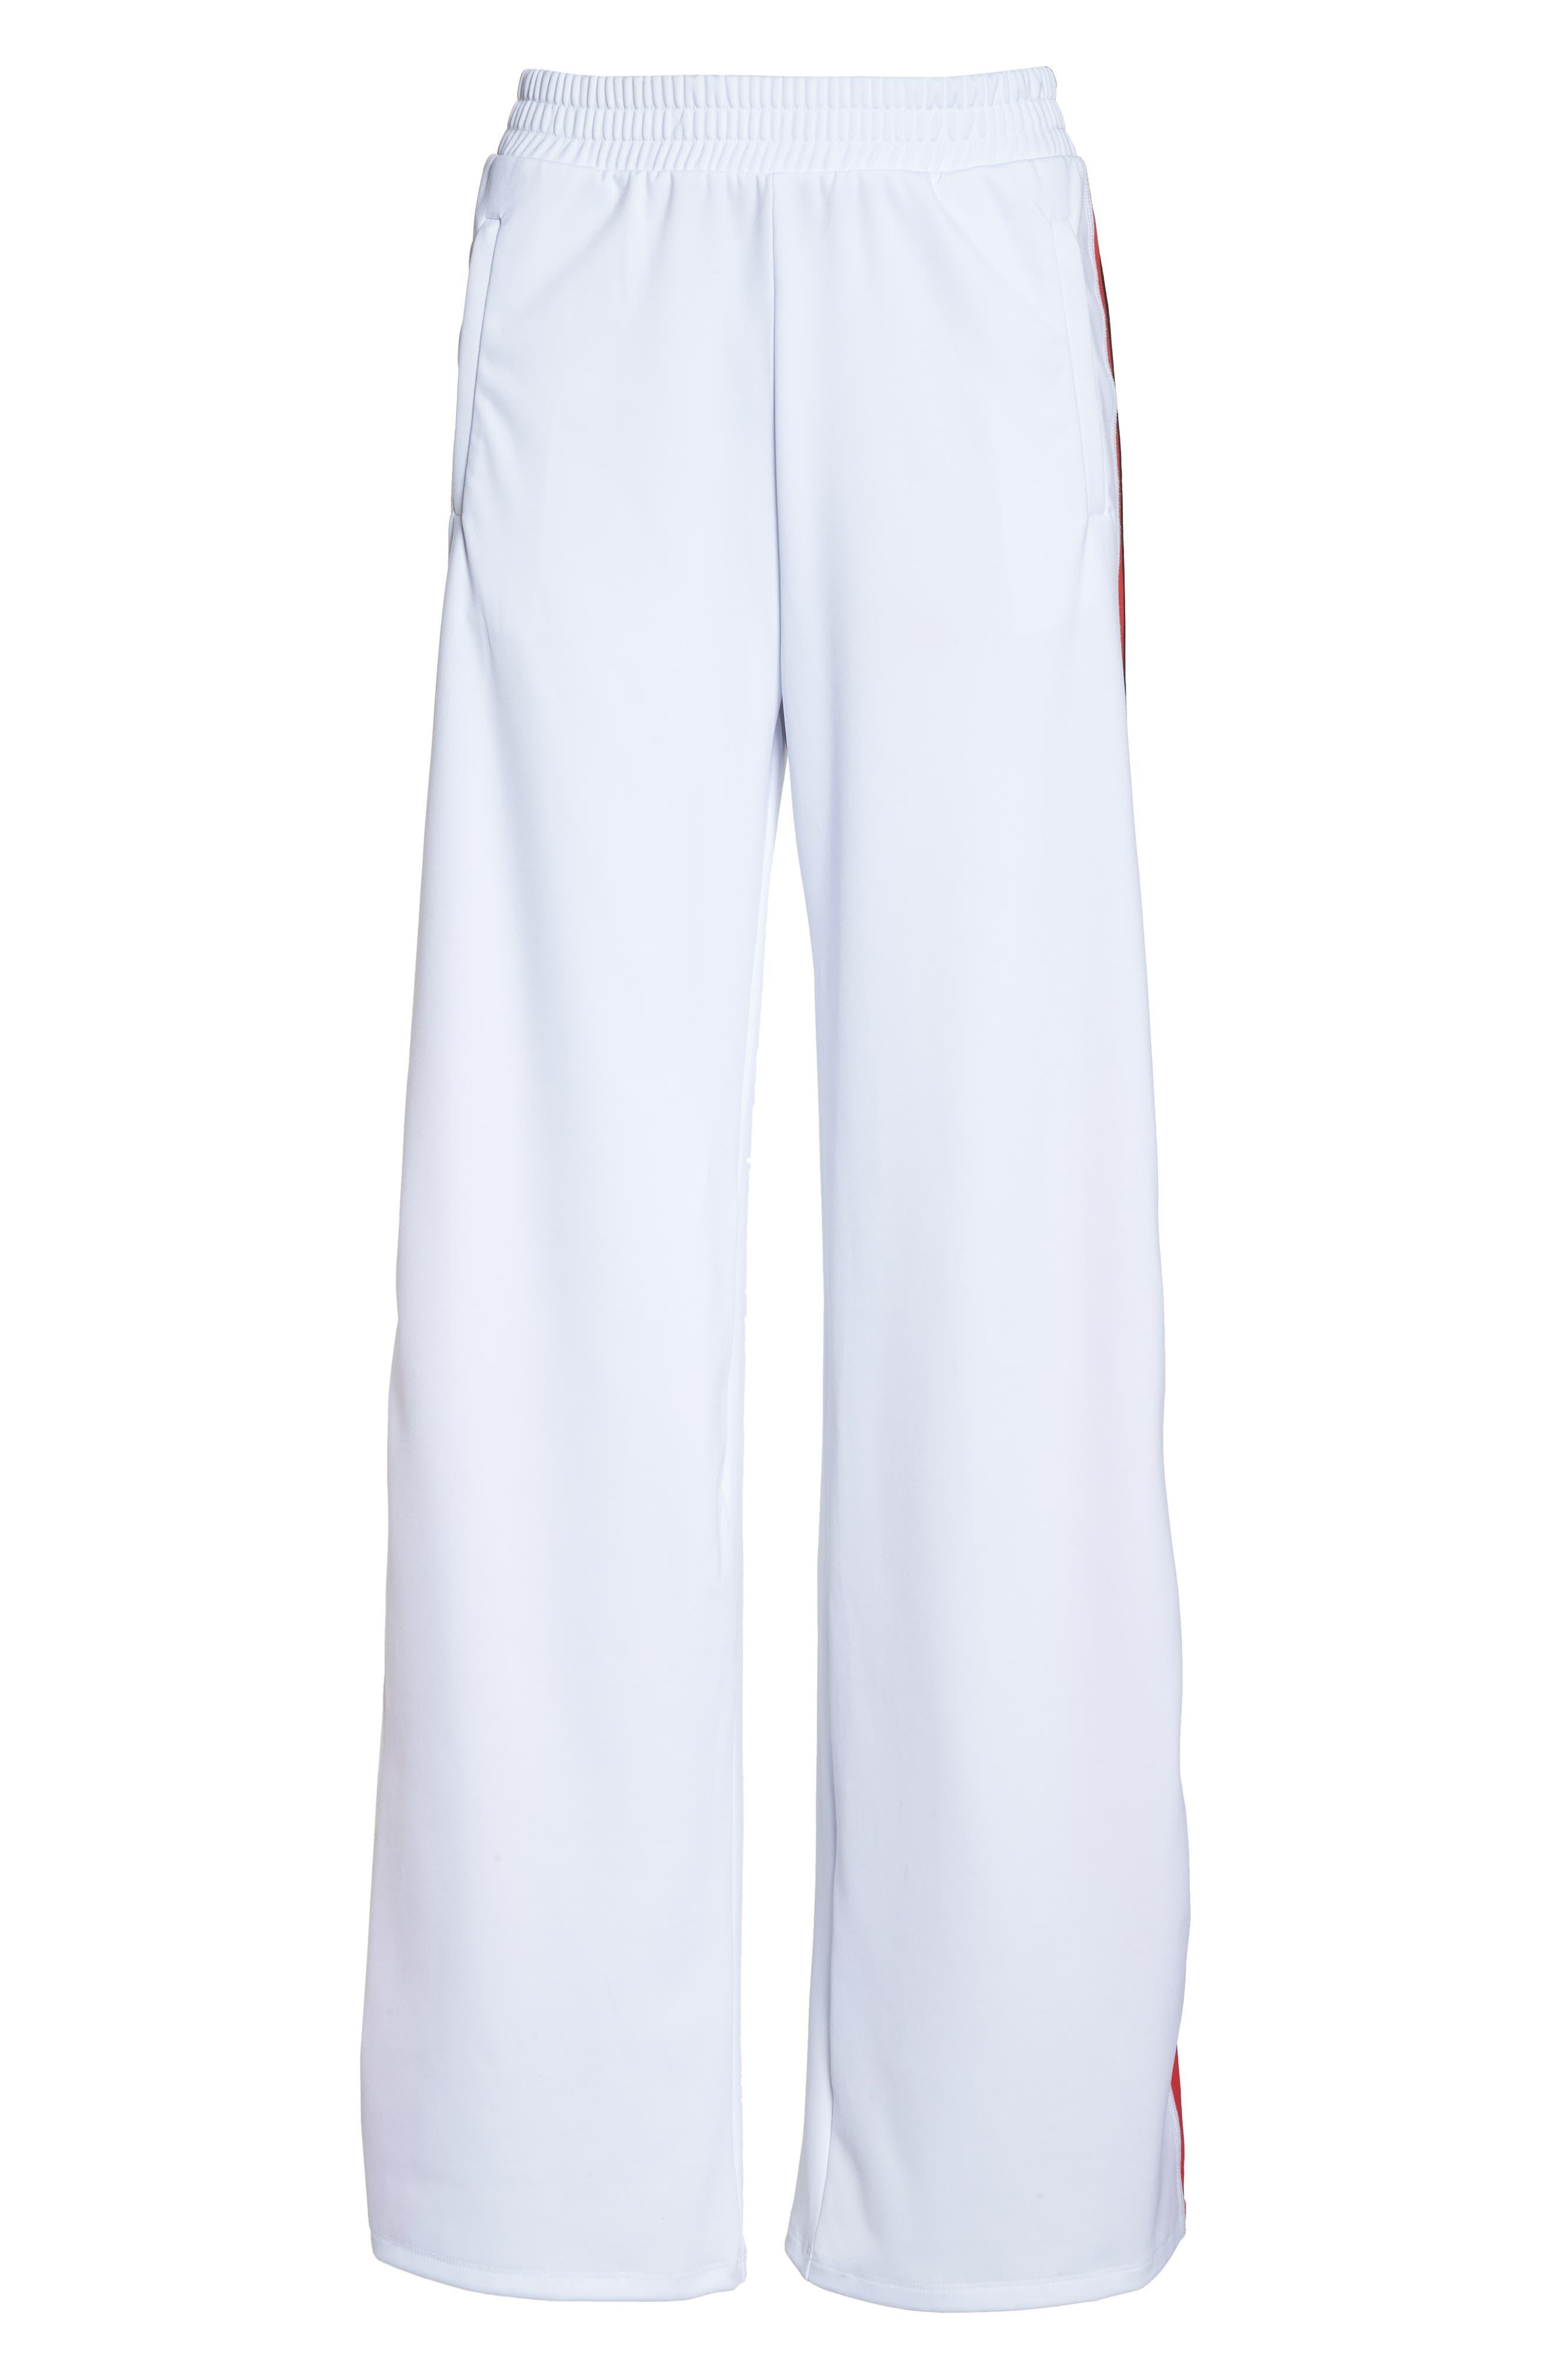 Wide Leg Track Pants,                             Alternate thumbnail 7, color,                             100